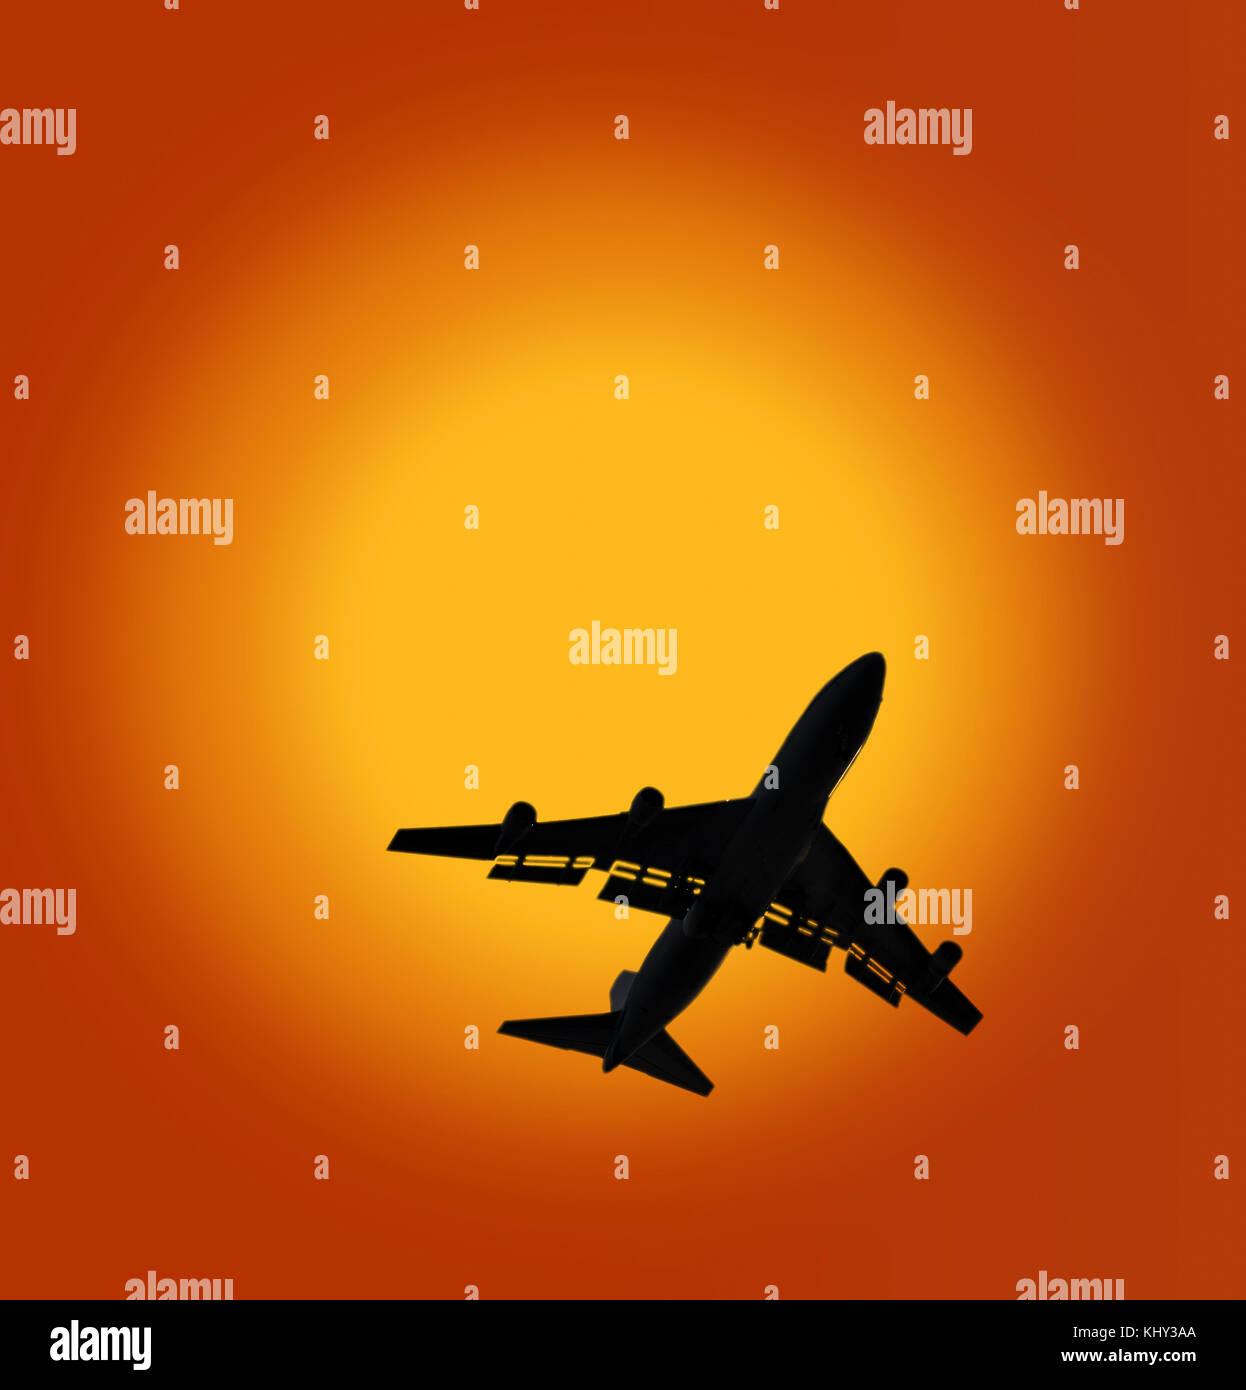 Jumbo jet boeing 747 crossing sun disc - Stock Image